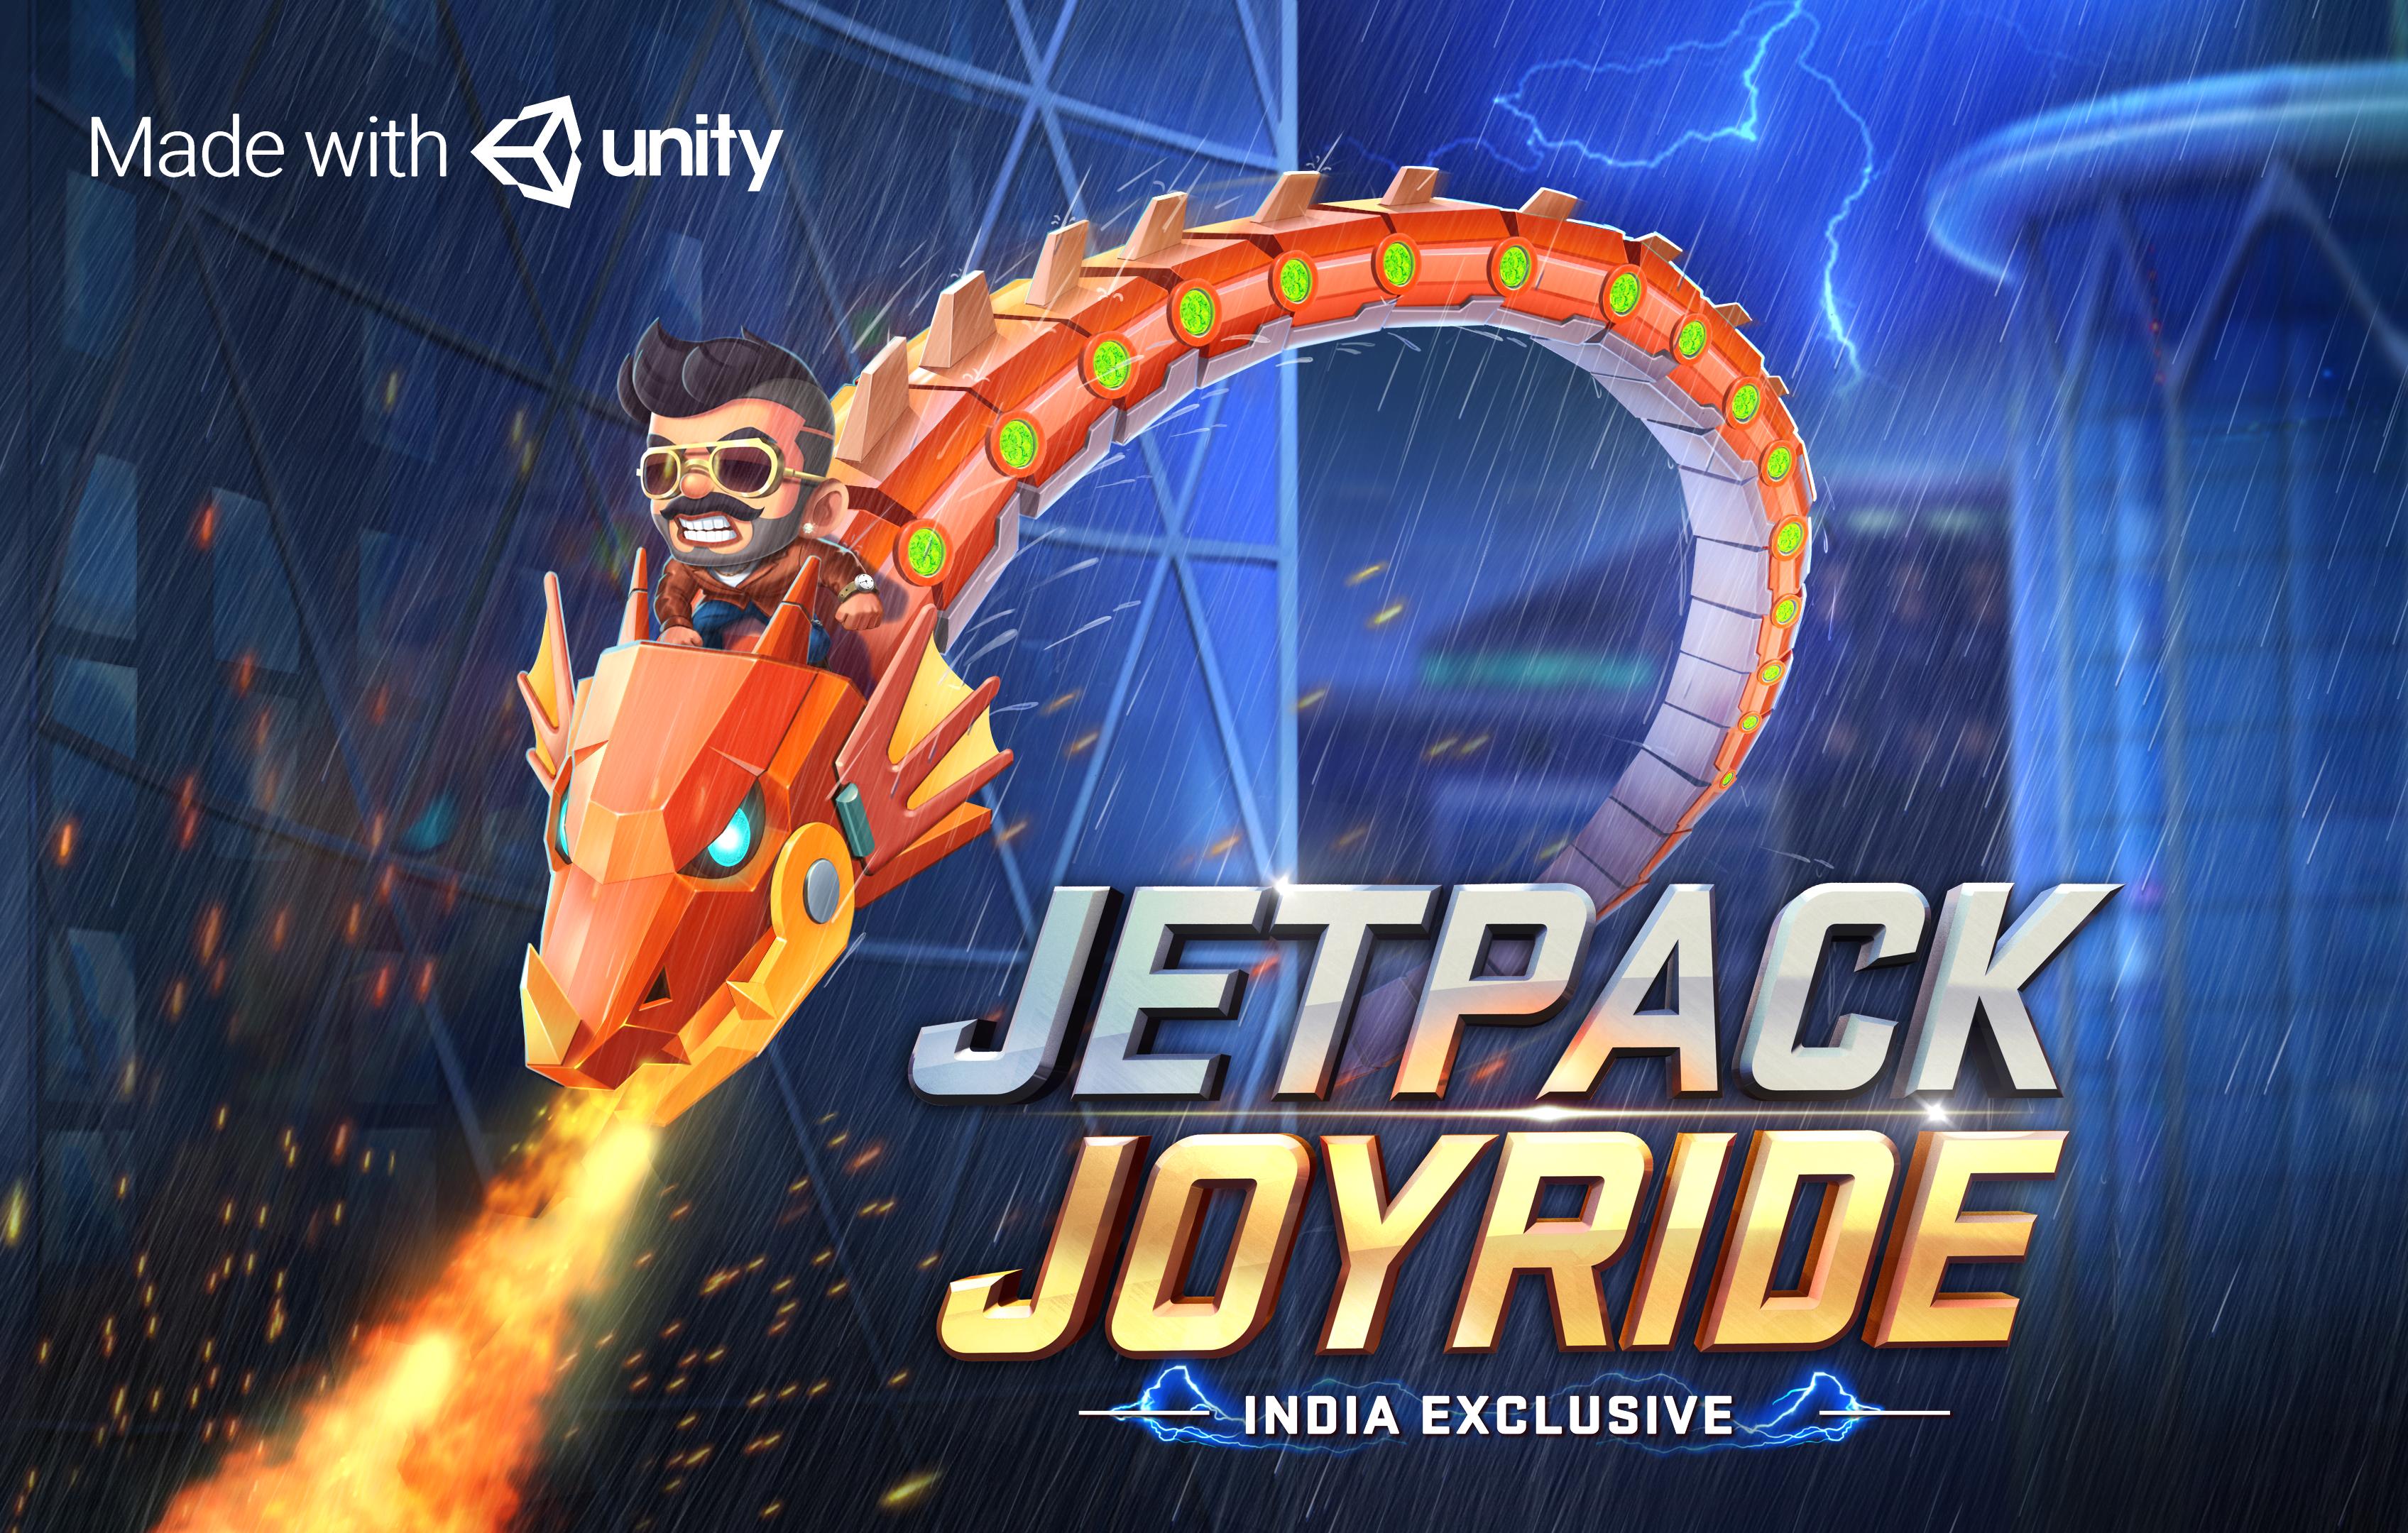 Jetpack Joyride India - Unity Connect